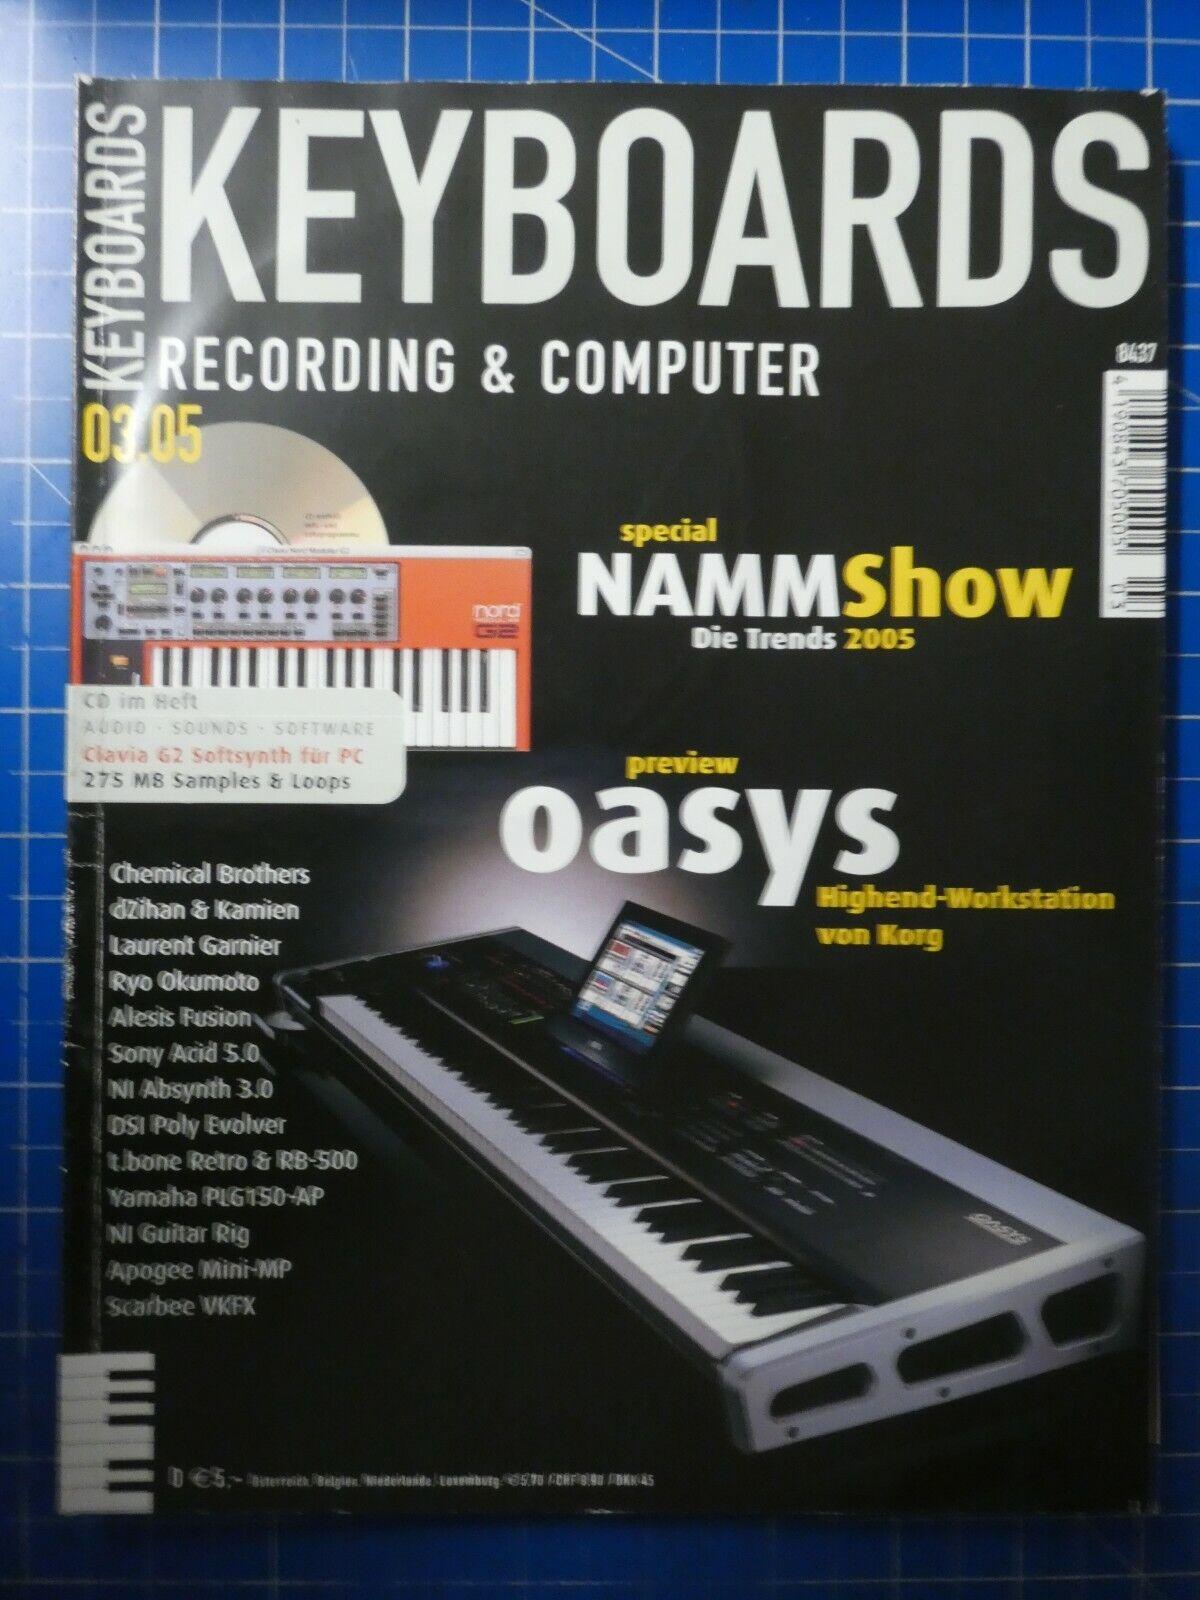 Keyboards Recording&Computer März 2005 oasys Sony Yamaha To626